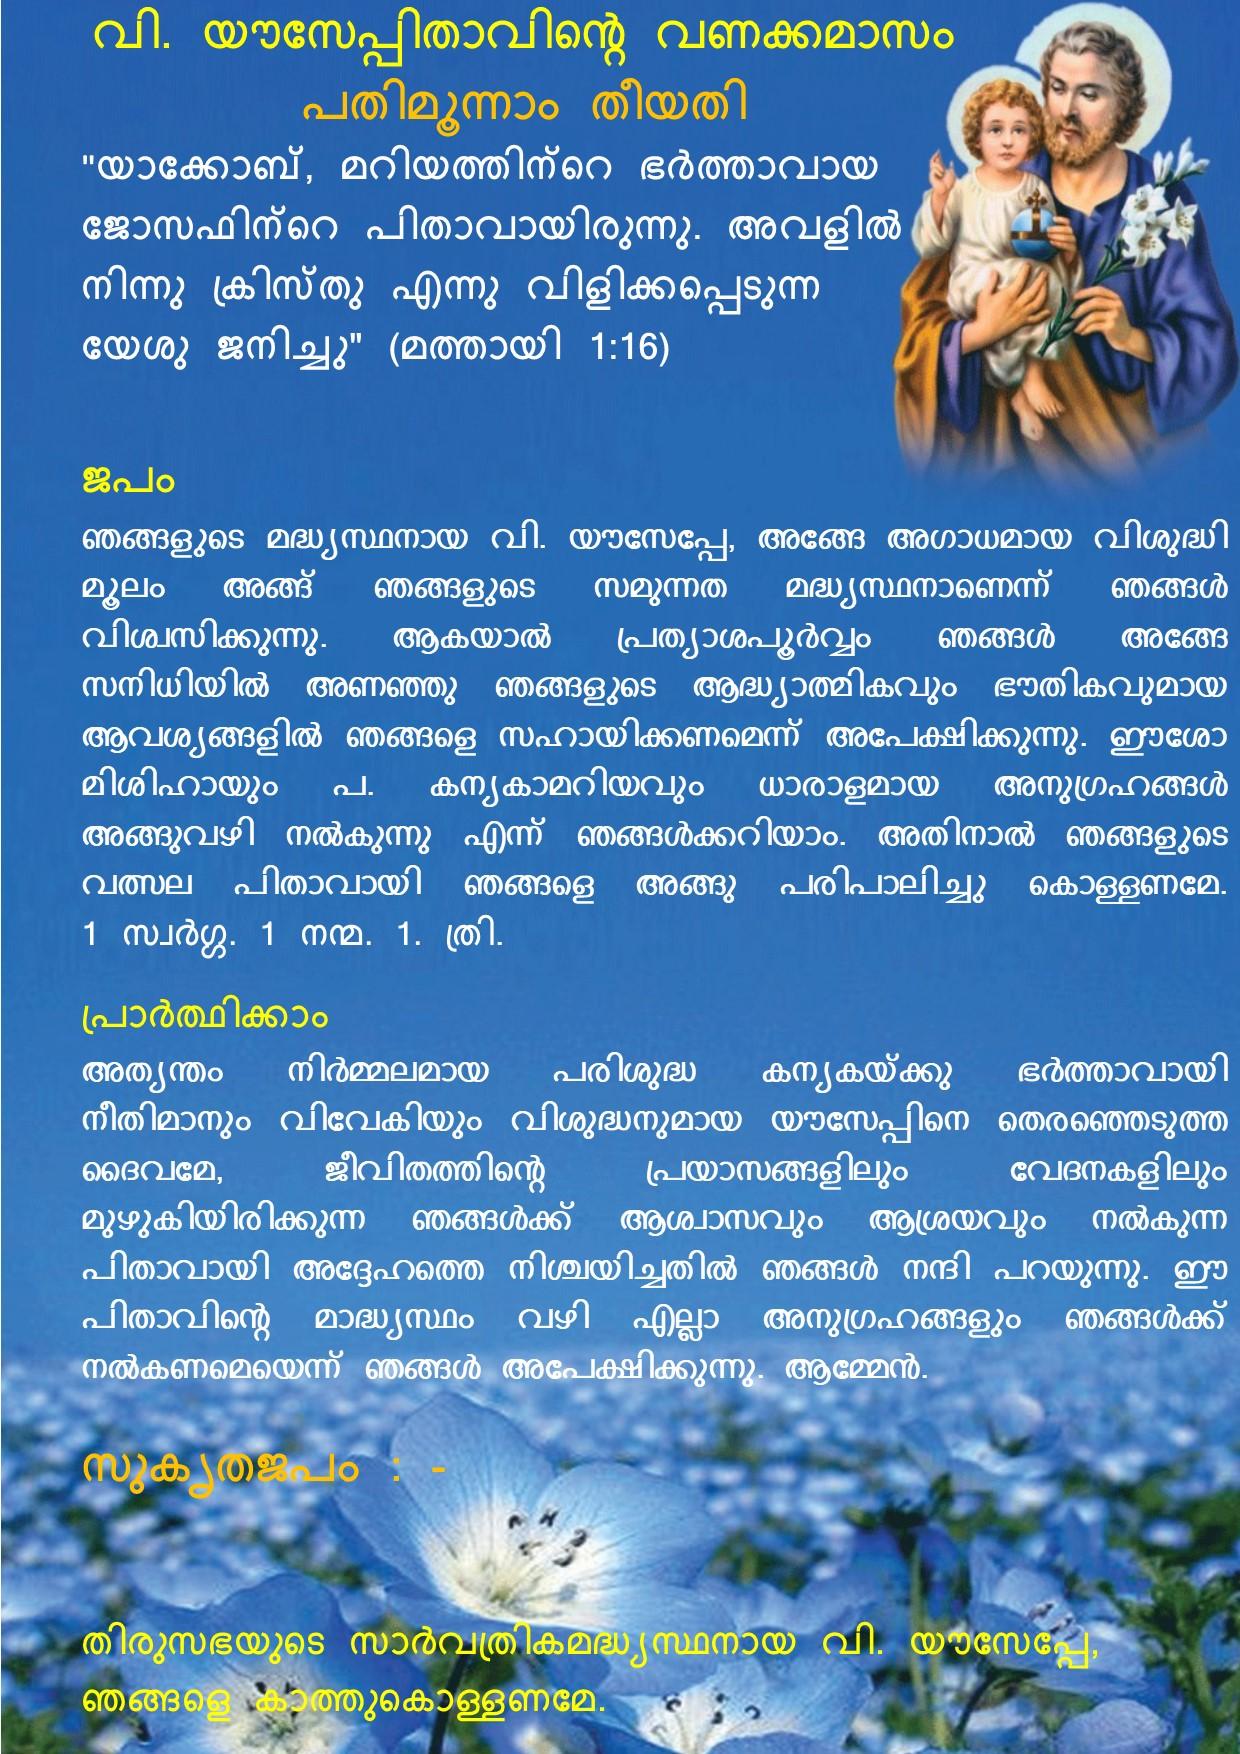 Vanakkamasam, St Joseph, March 13